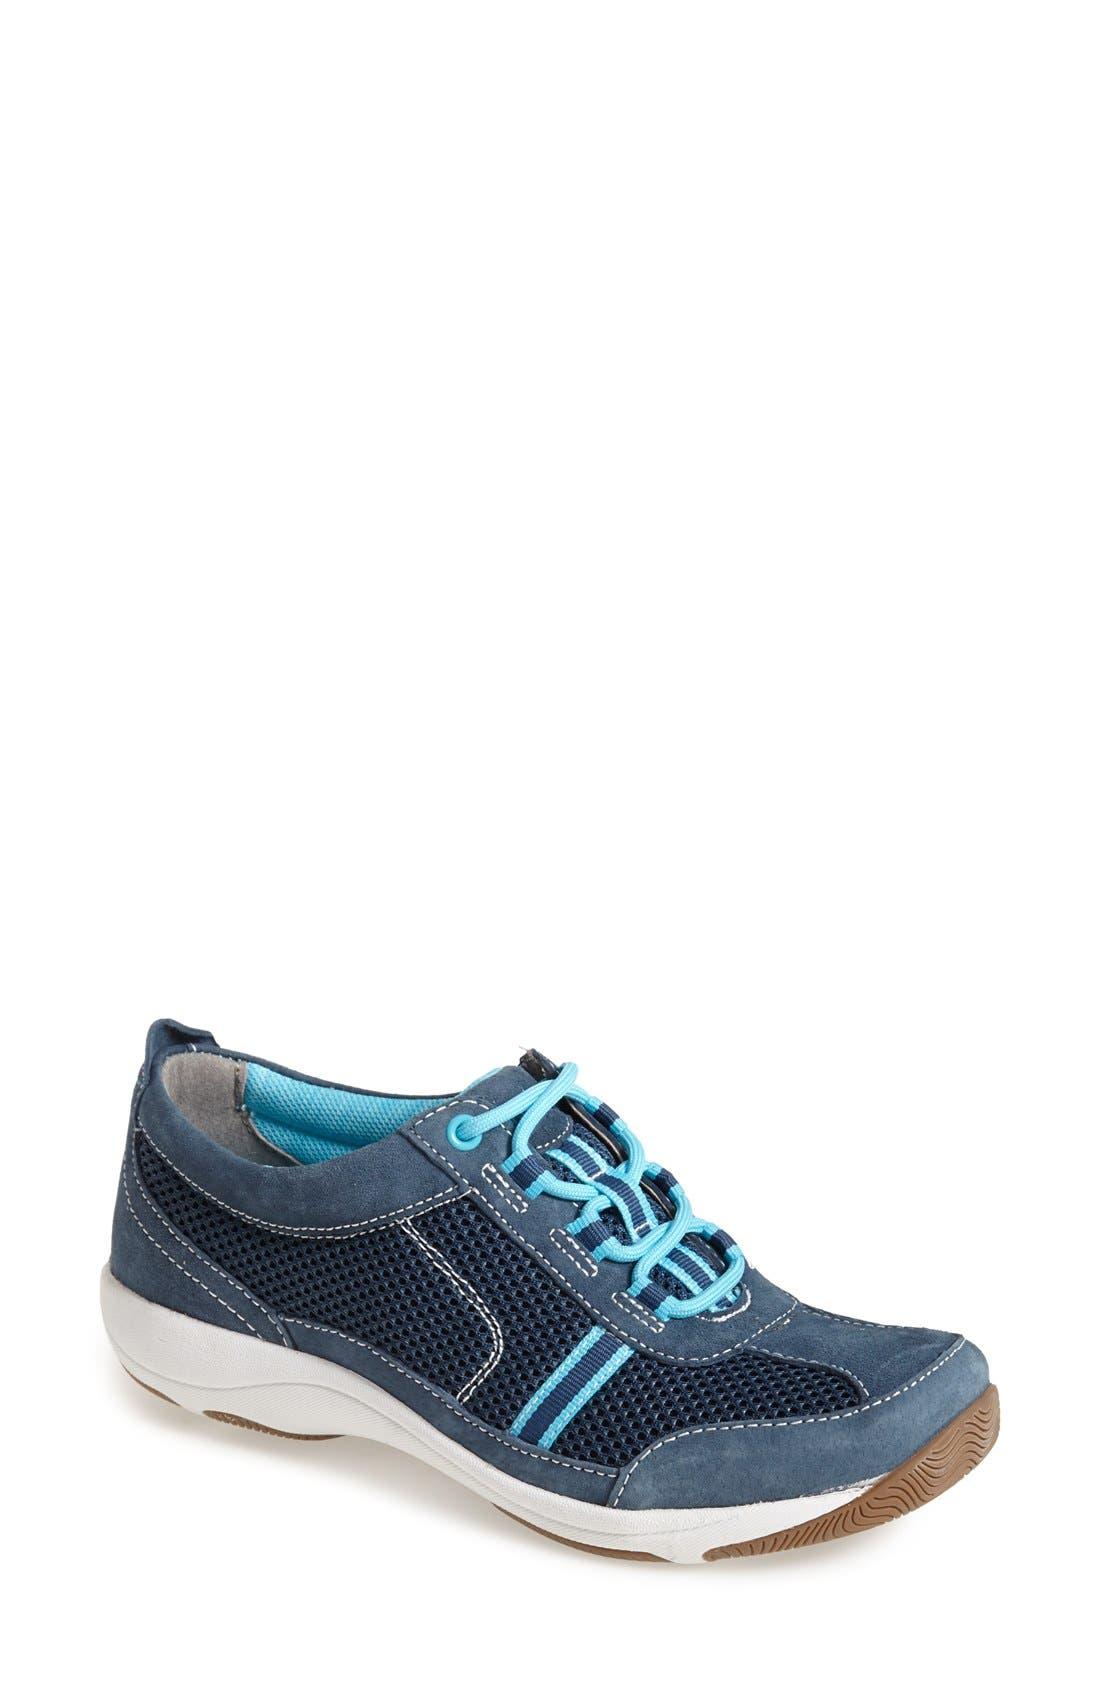 'Helen' Suede & Mesh Sneaker,                             Main thumbnail 11, color,